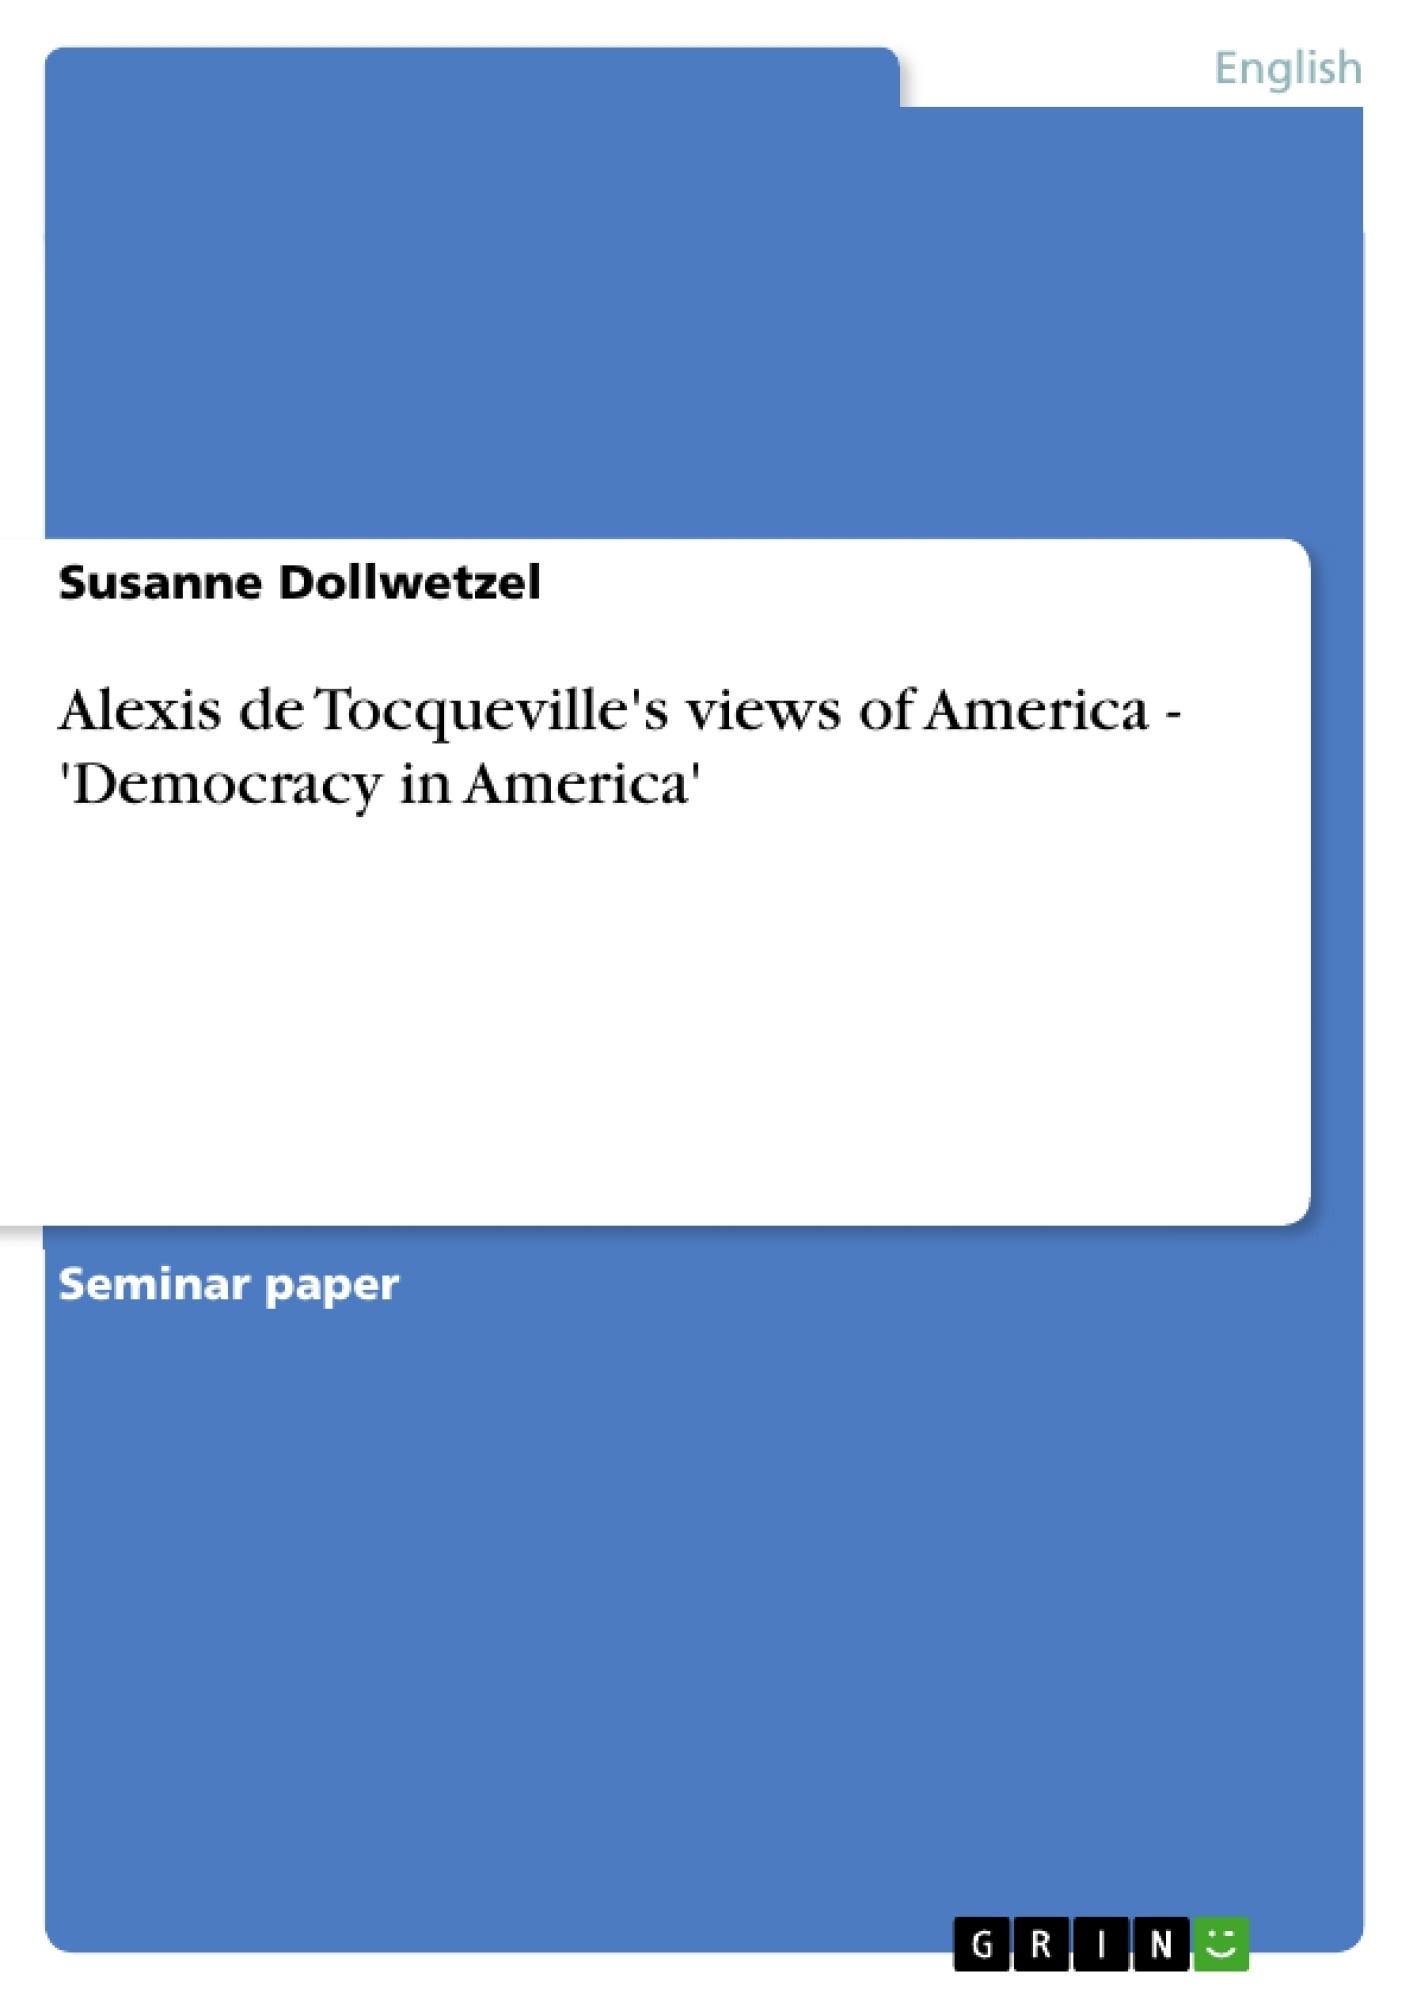 Title: Alexis de Tocqueville's views of America - 'Democracy in America'